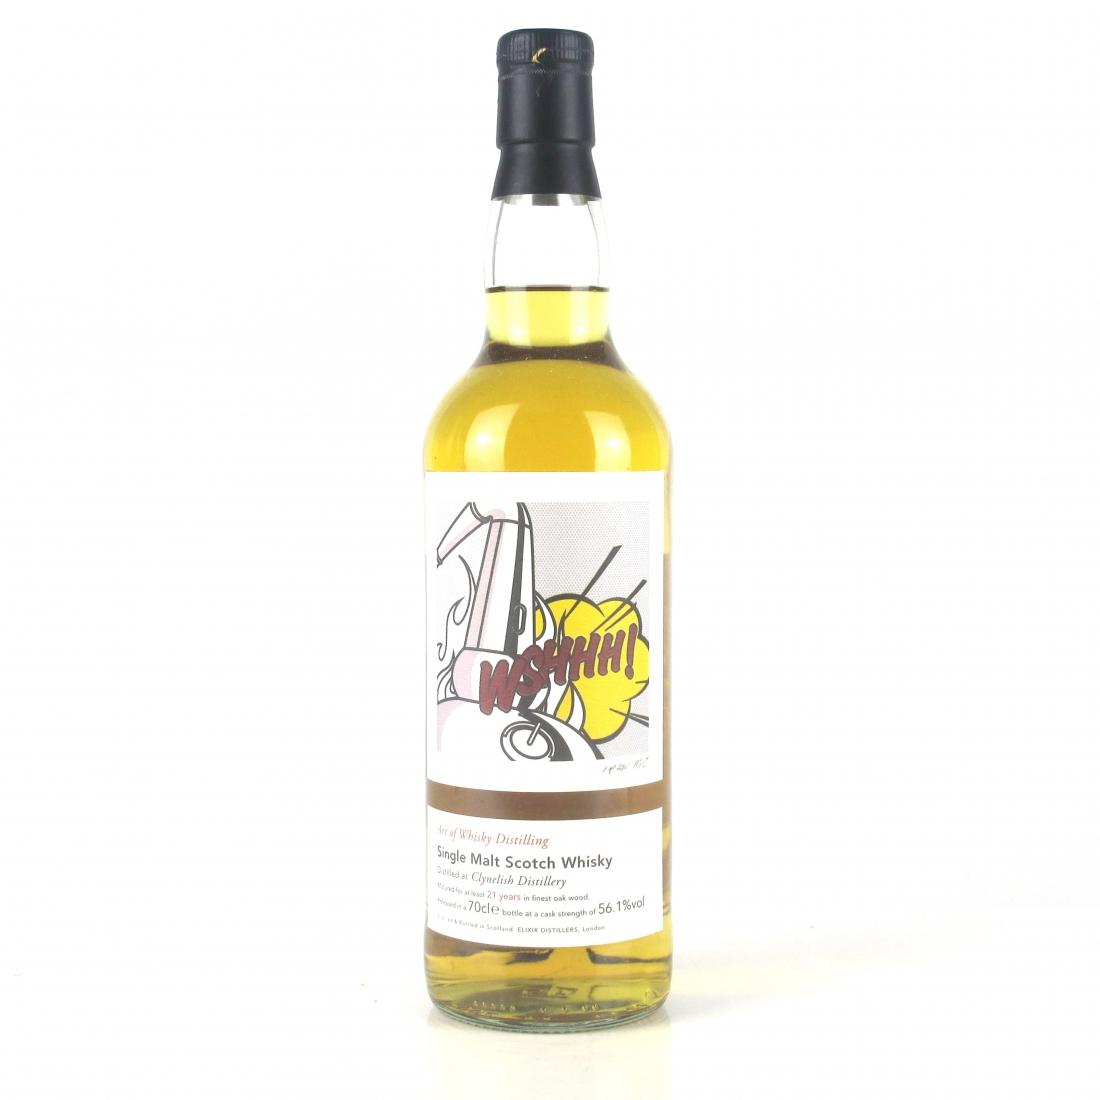 Clynelish Elixir Distillers 21 Year Old / Art of Whisky